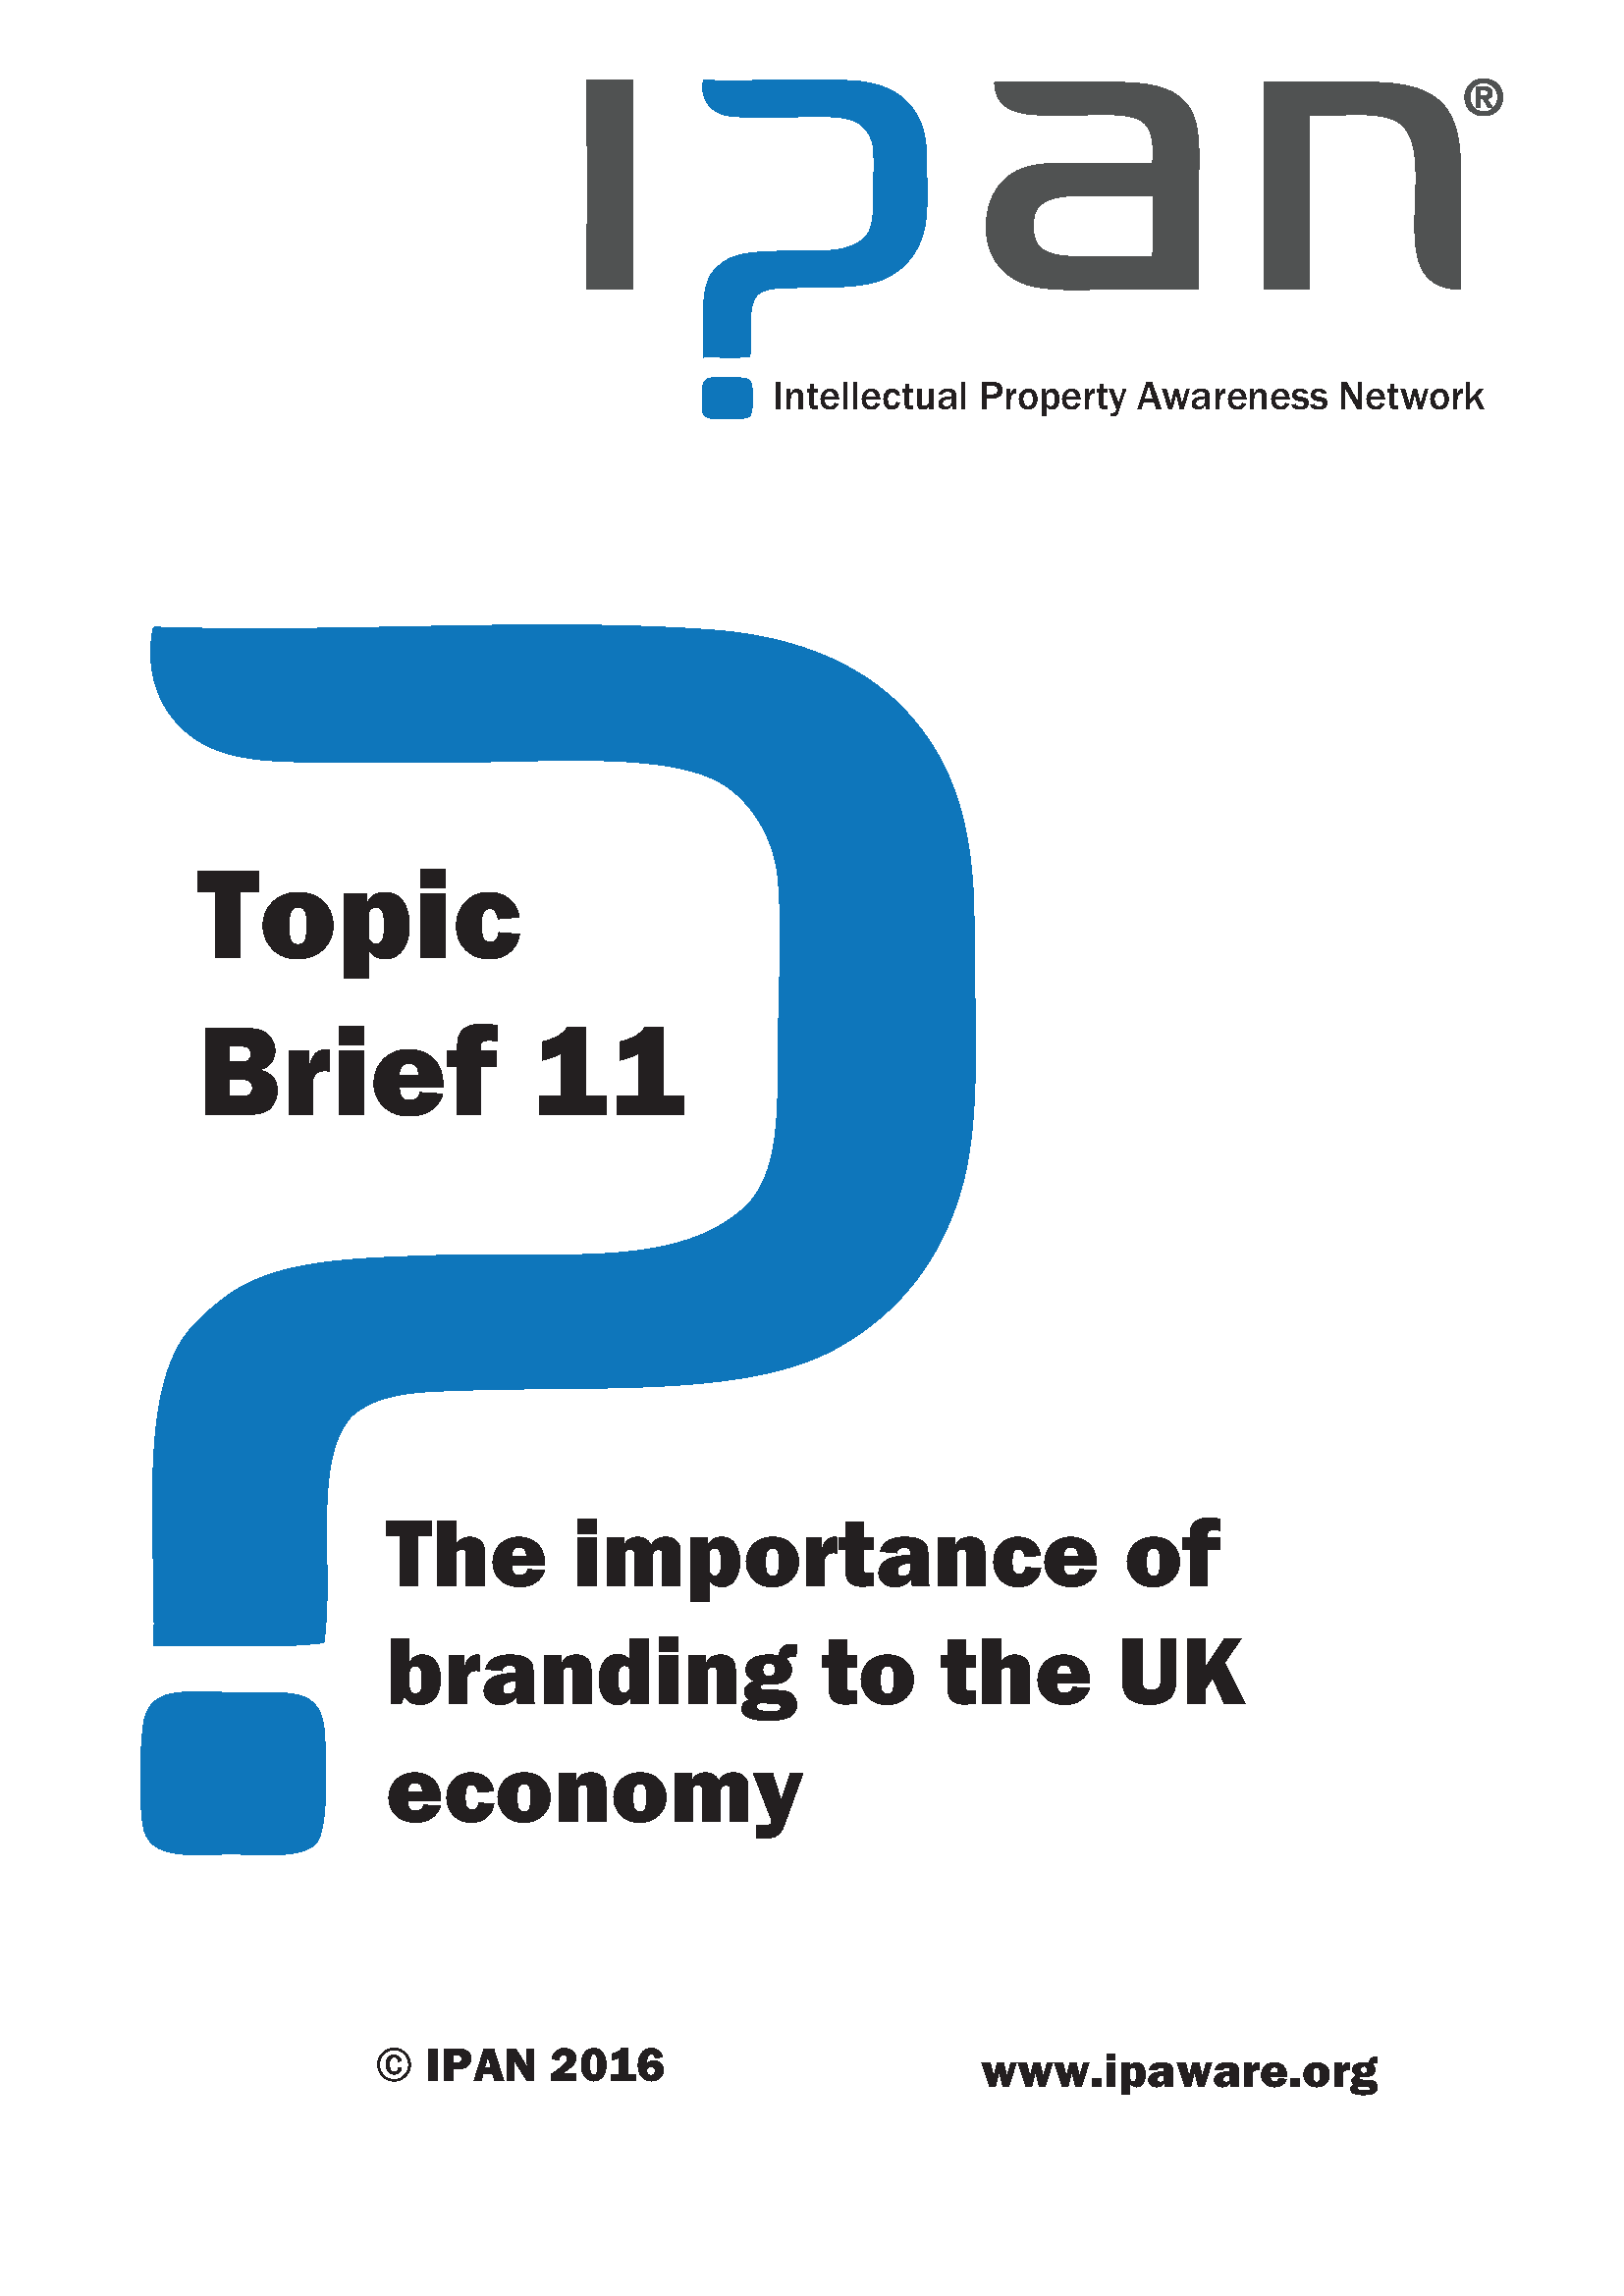 Importance of branding to UK economy